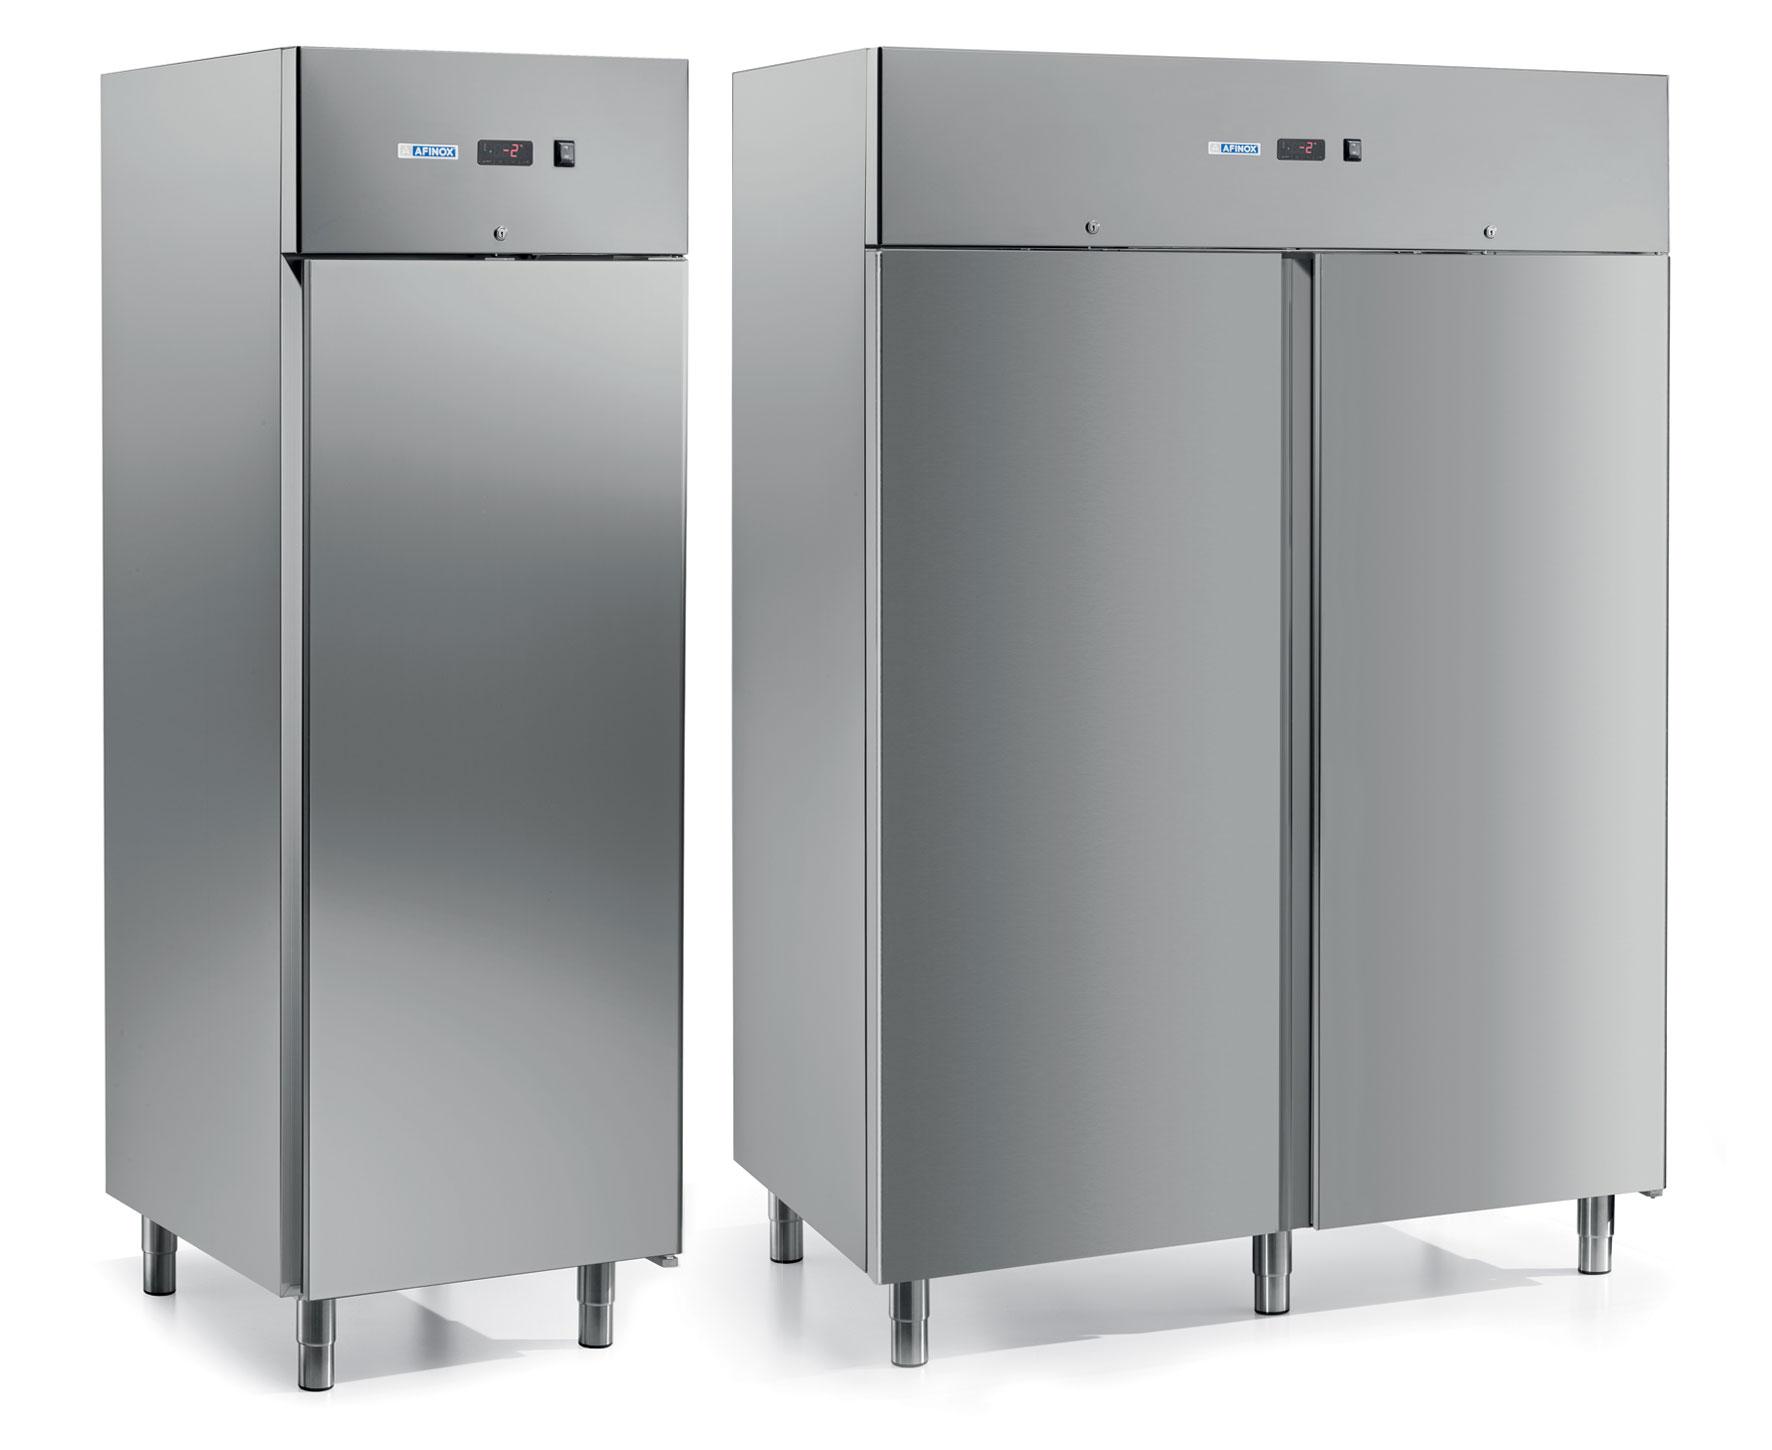 armadi refrigerati, Kühlschränke, Armoires réfrigérées,